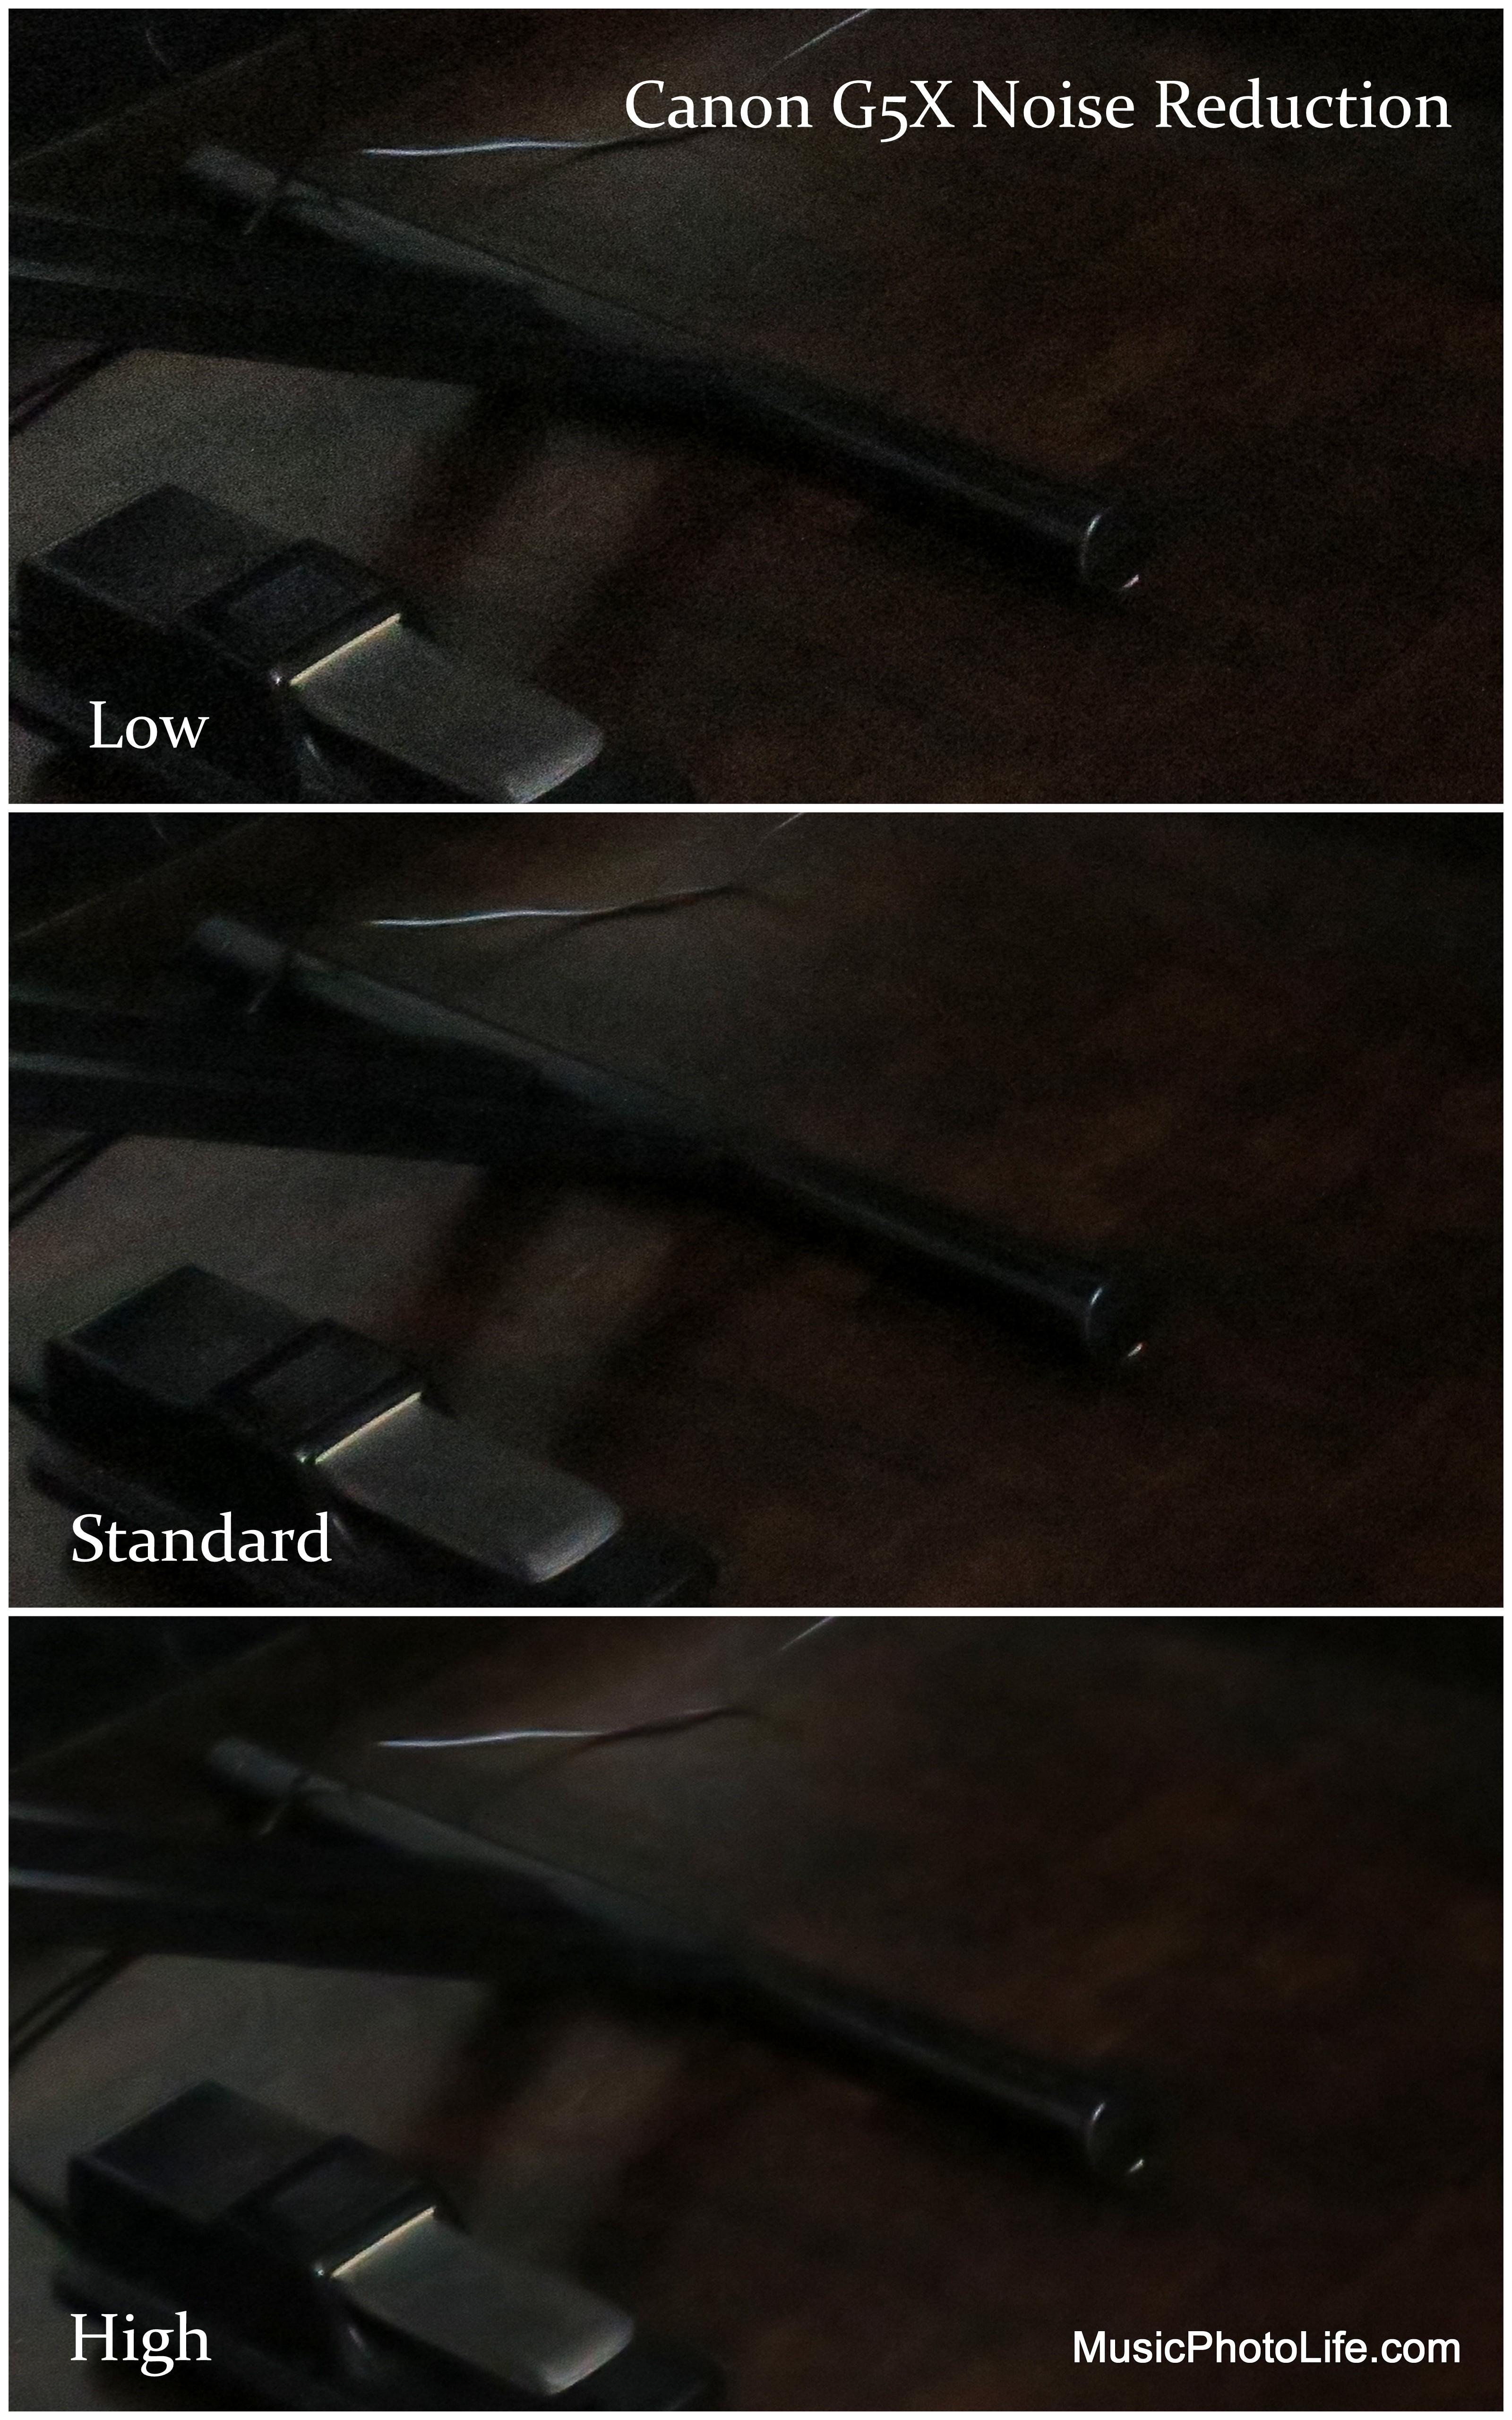 Canon G5X noise reduction levels